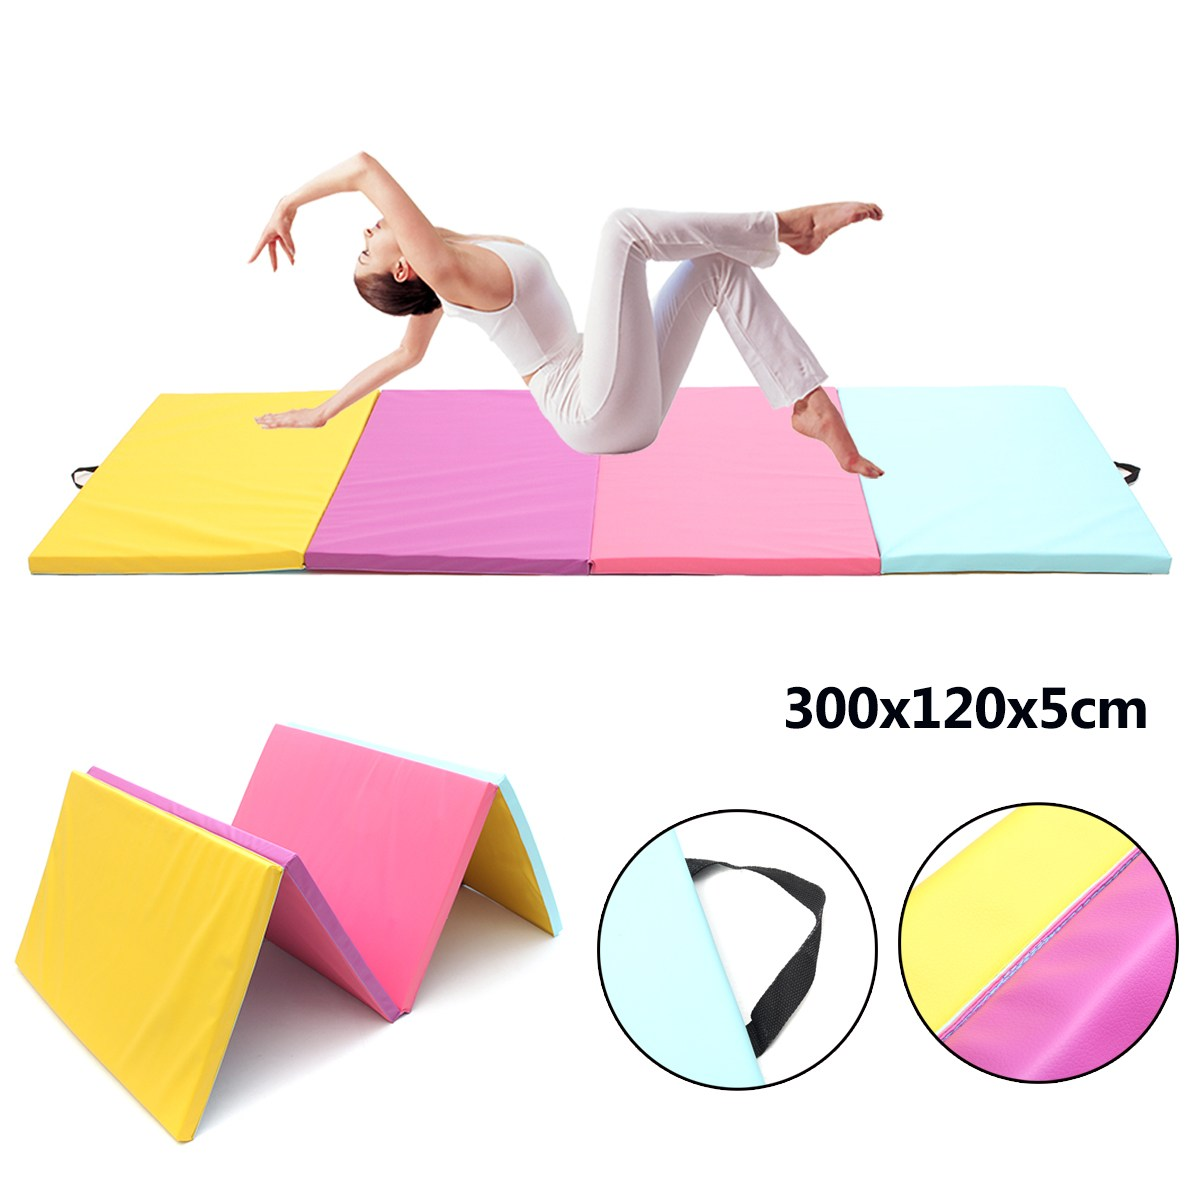 9ft 4 Folding Pu Leder Gymnastik Boden Tanzen Übung Matte Yoga Ausbildung Pad